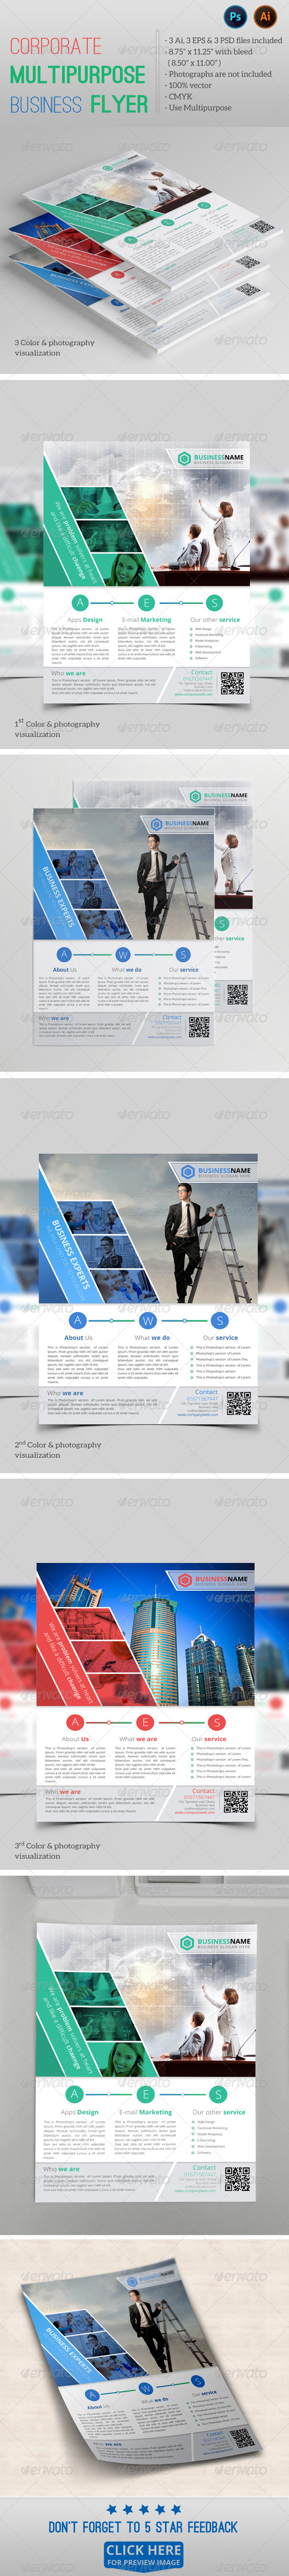 GraphicRiver Corporate Multipurpose Business Flyer vol.03 7946172